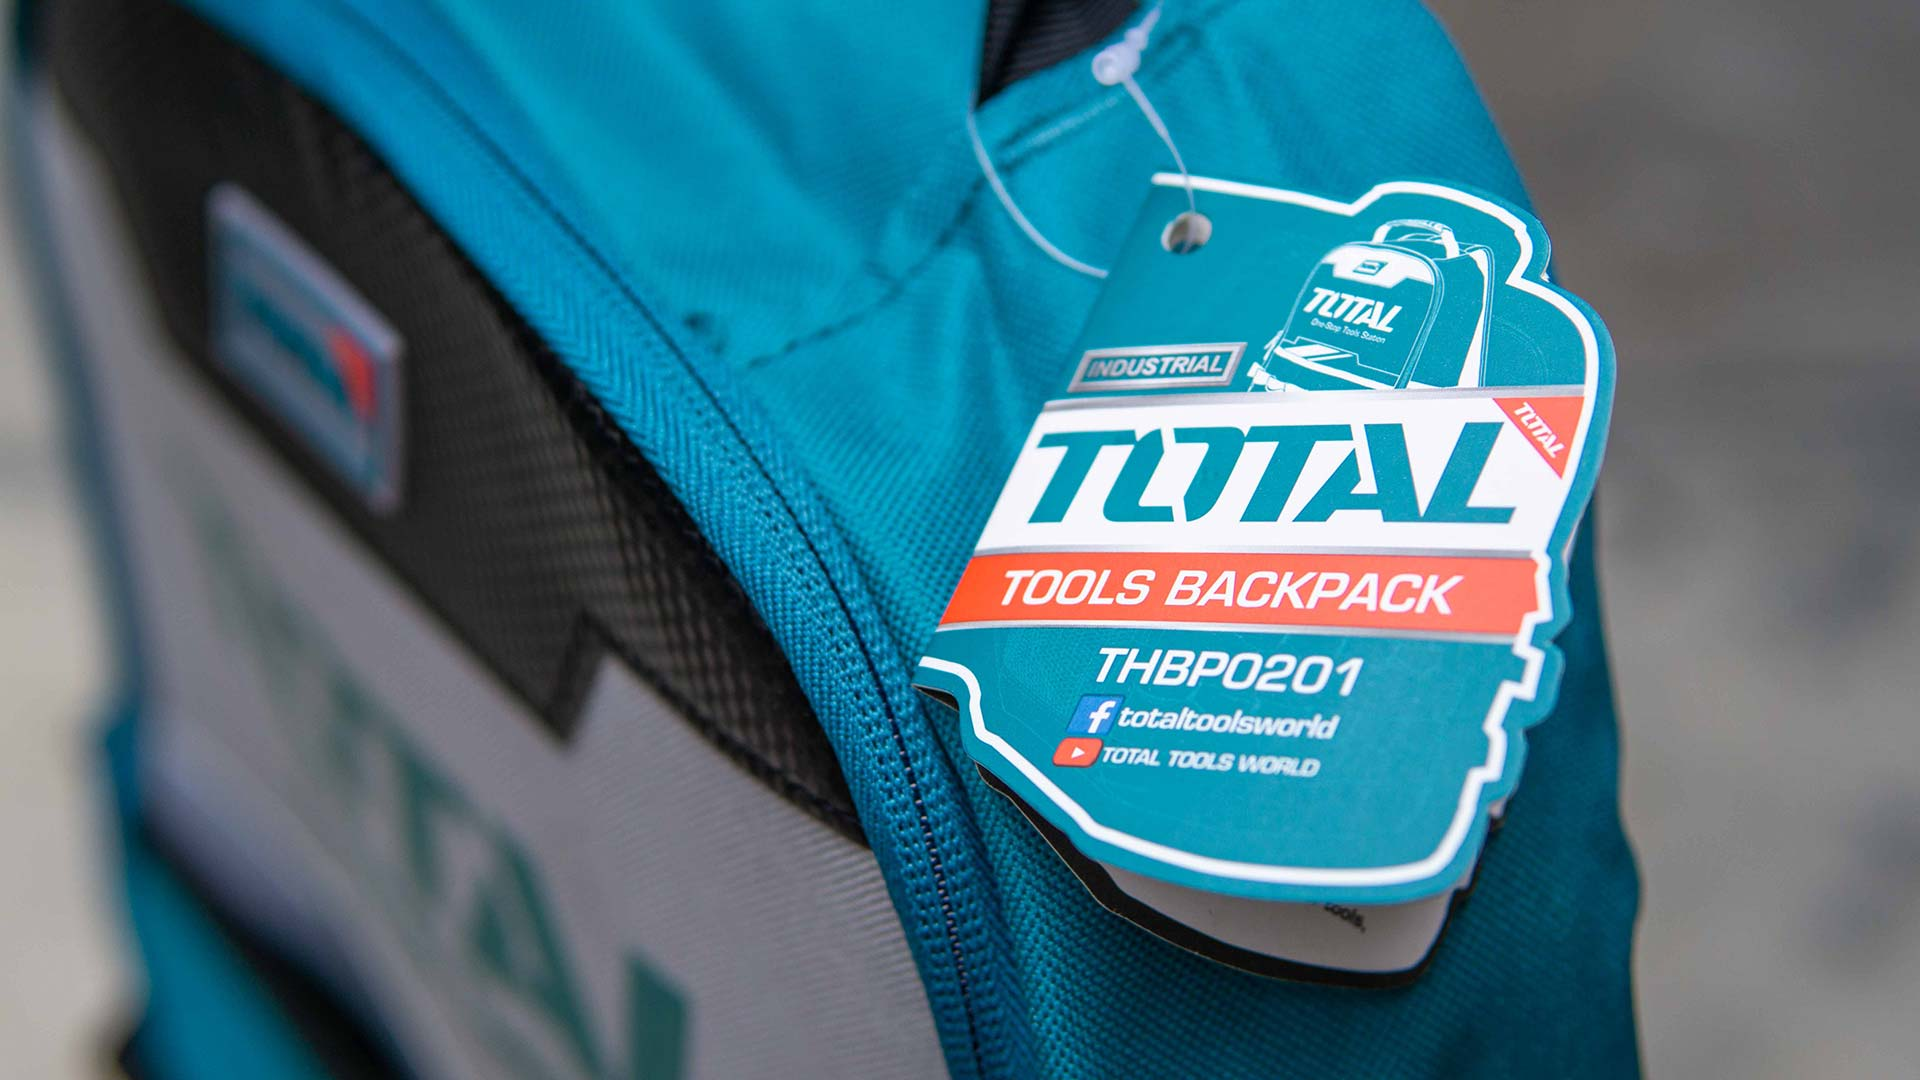 THBP0201 photo shoot